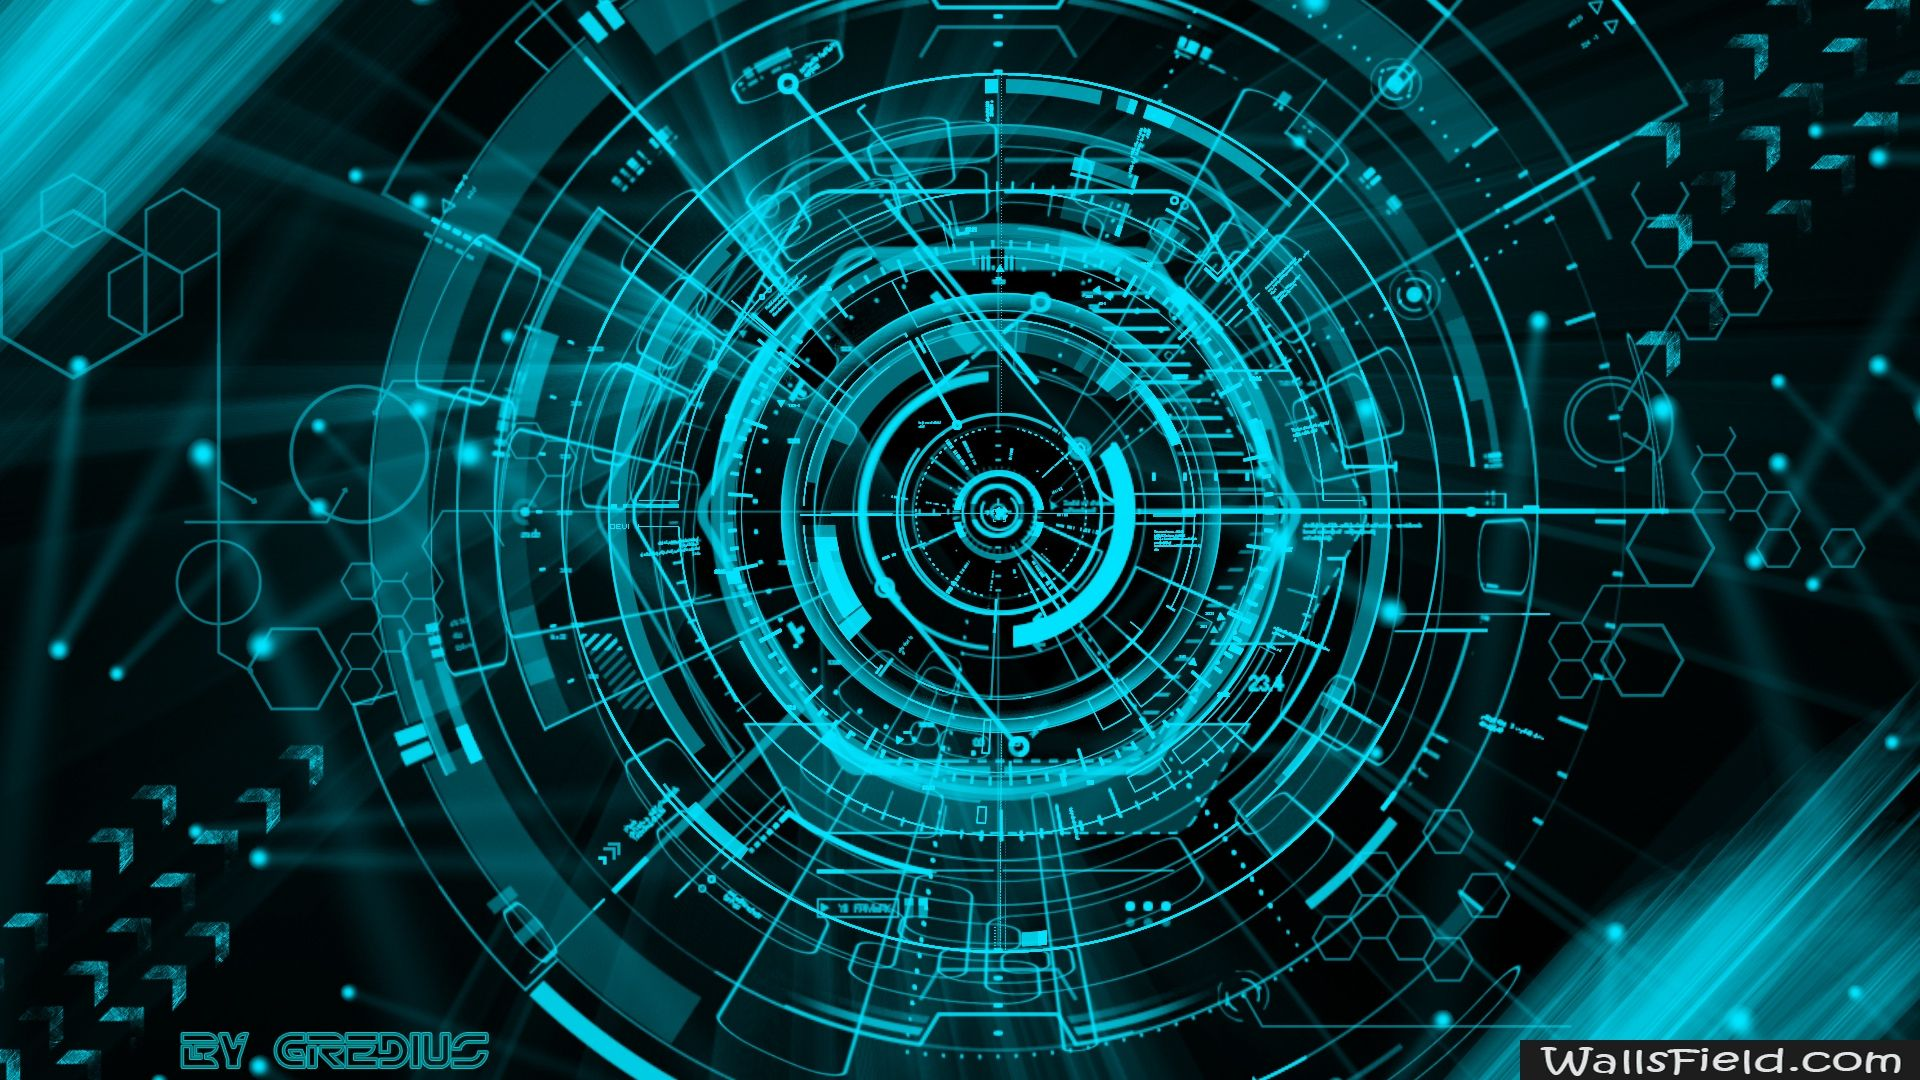 Techno Wallpaper Wallsfield Com Free Hd Wallpapers Computer Wallpaper Hd Technology Wallpaper Computer Wallpaper